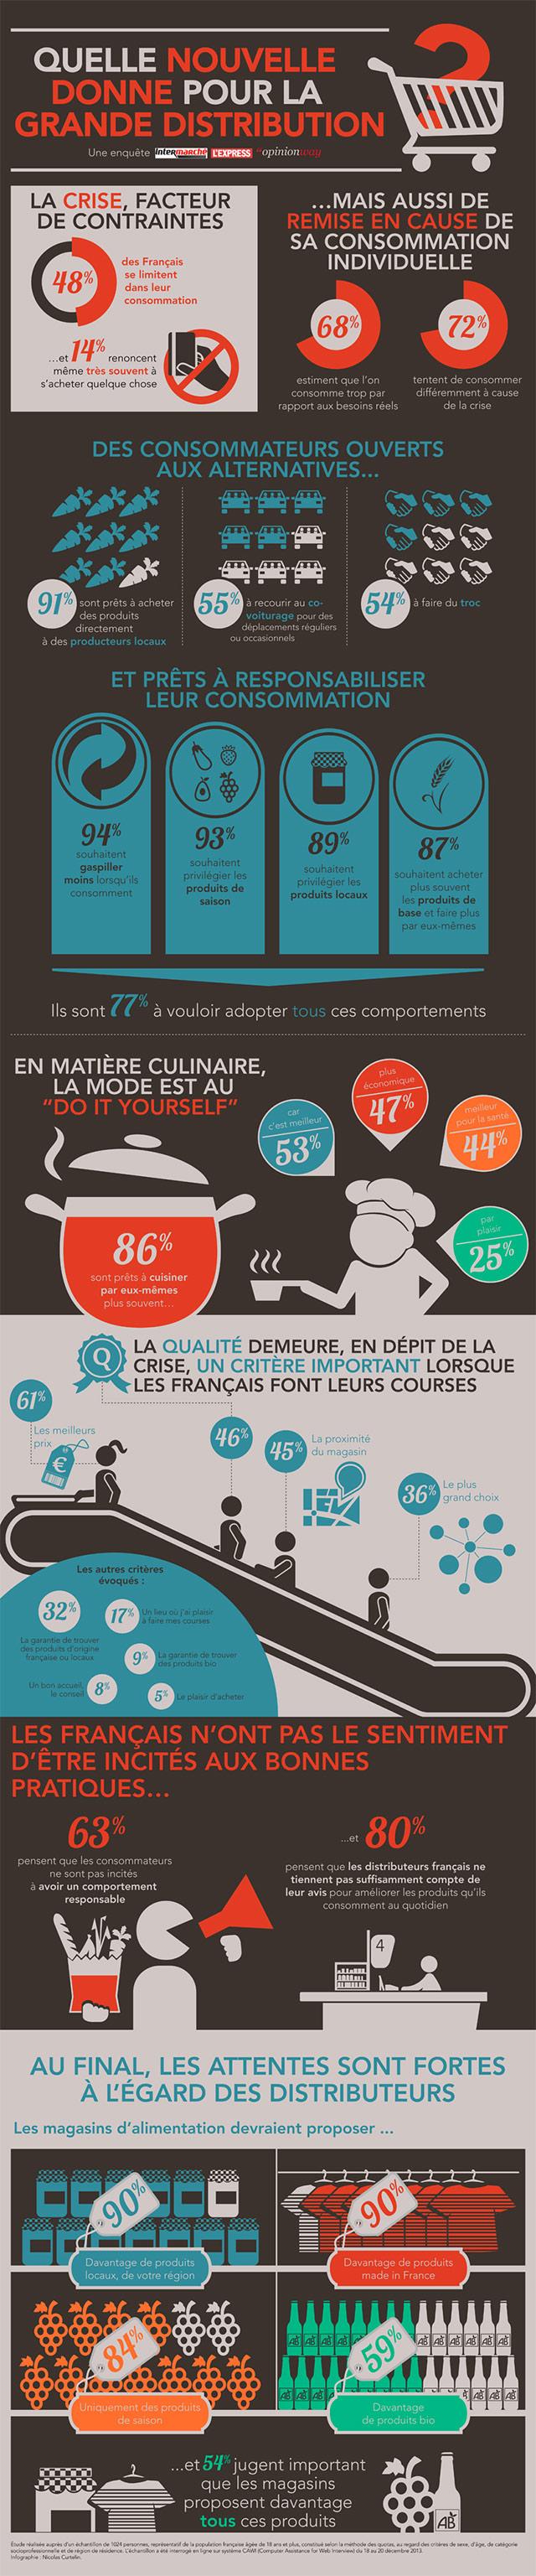 Infographie-Enquête-OpinionwayX640